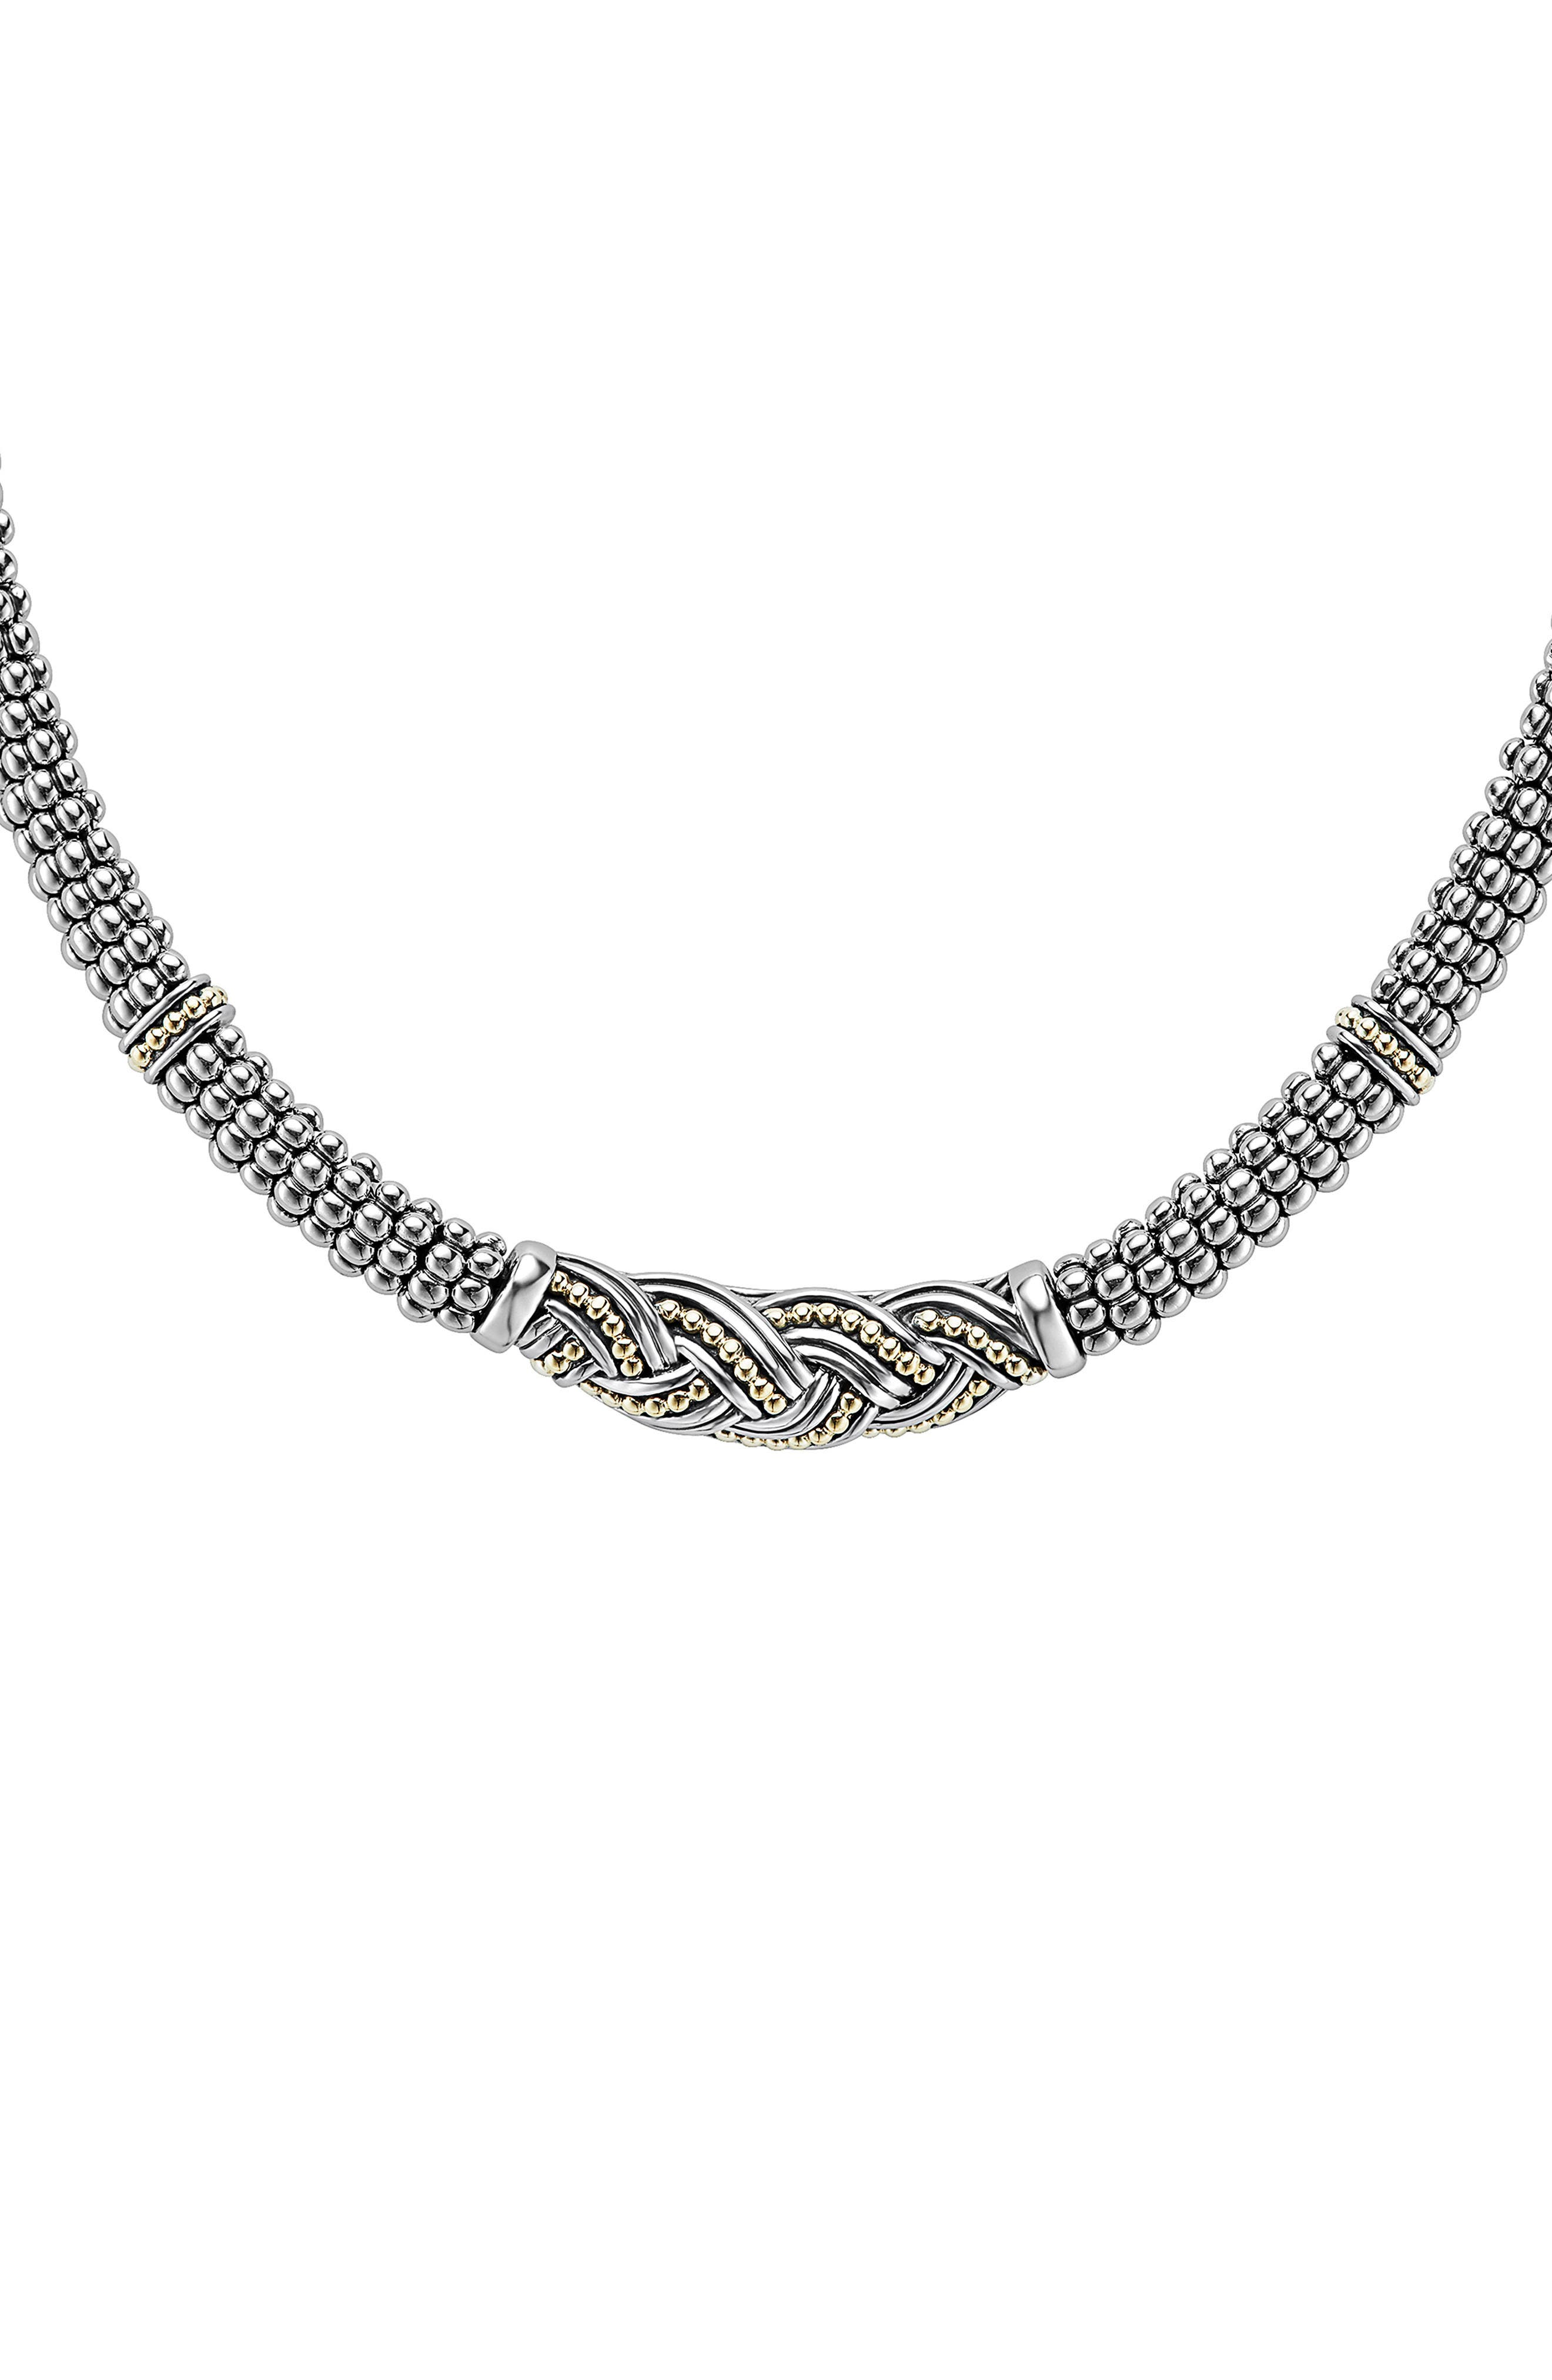 Torsade Rope Necklace,                         Main,                         color, Silver/ Gold